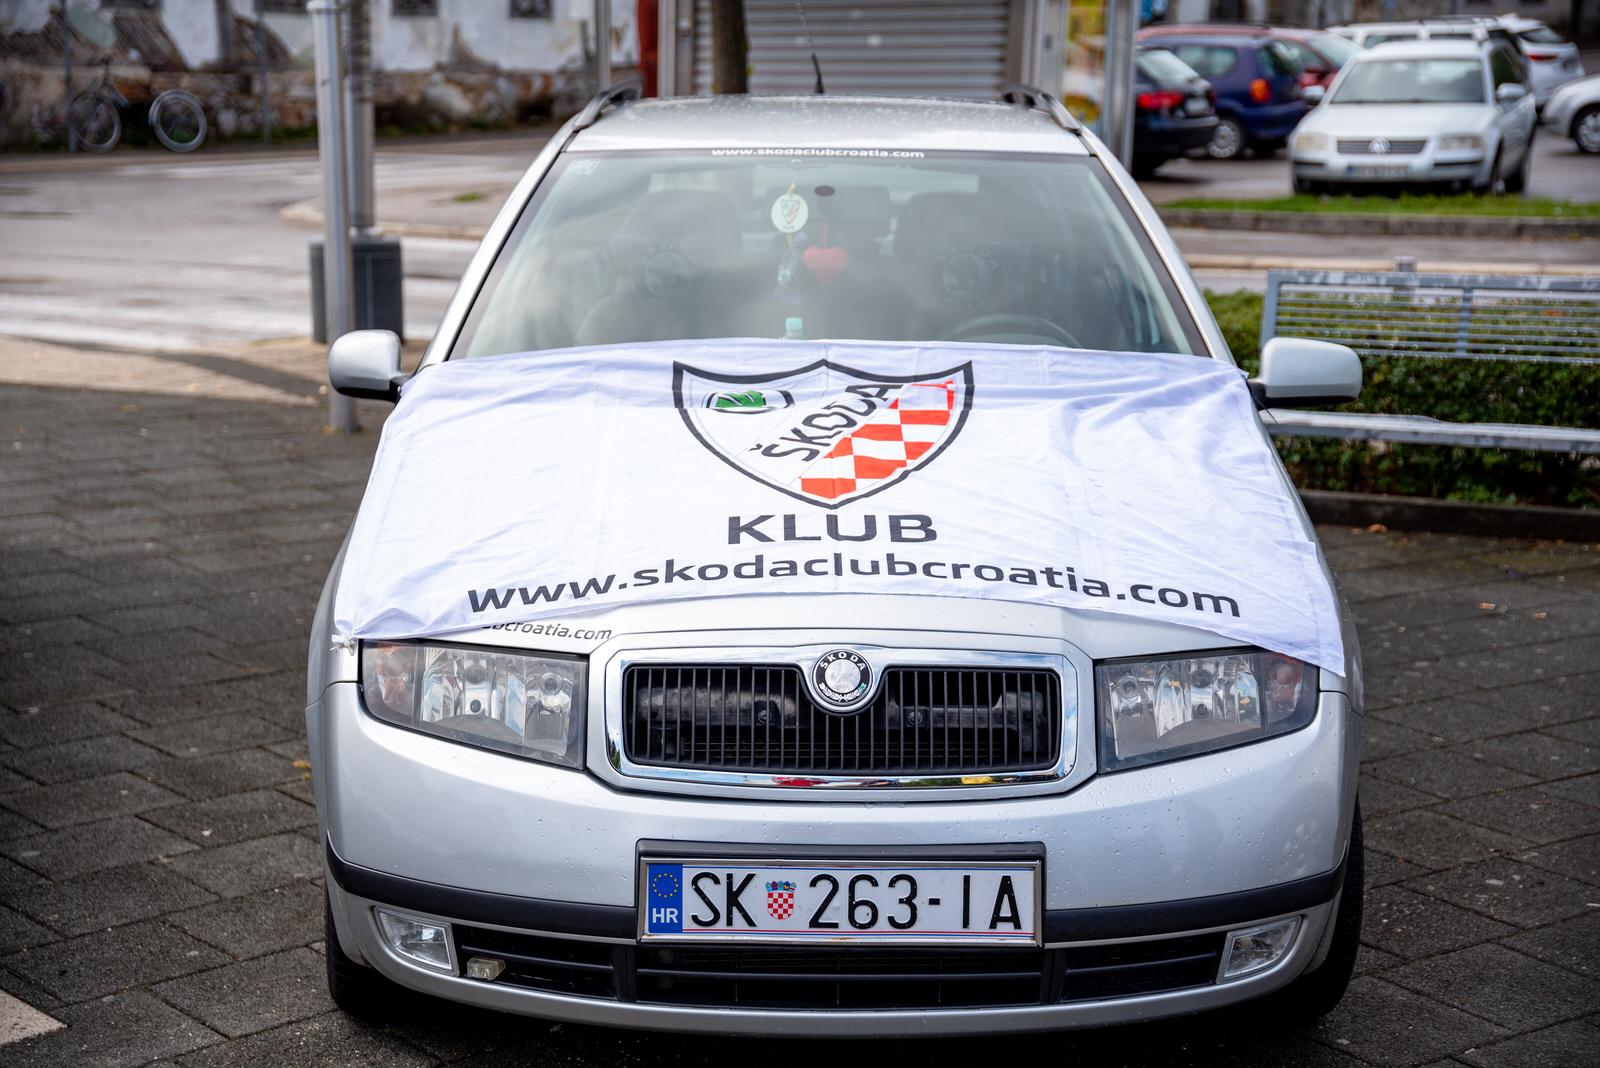 Škoda Club Susret Gospić-117